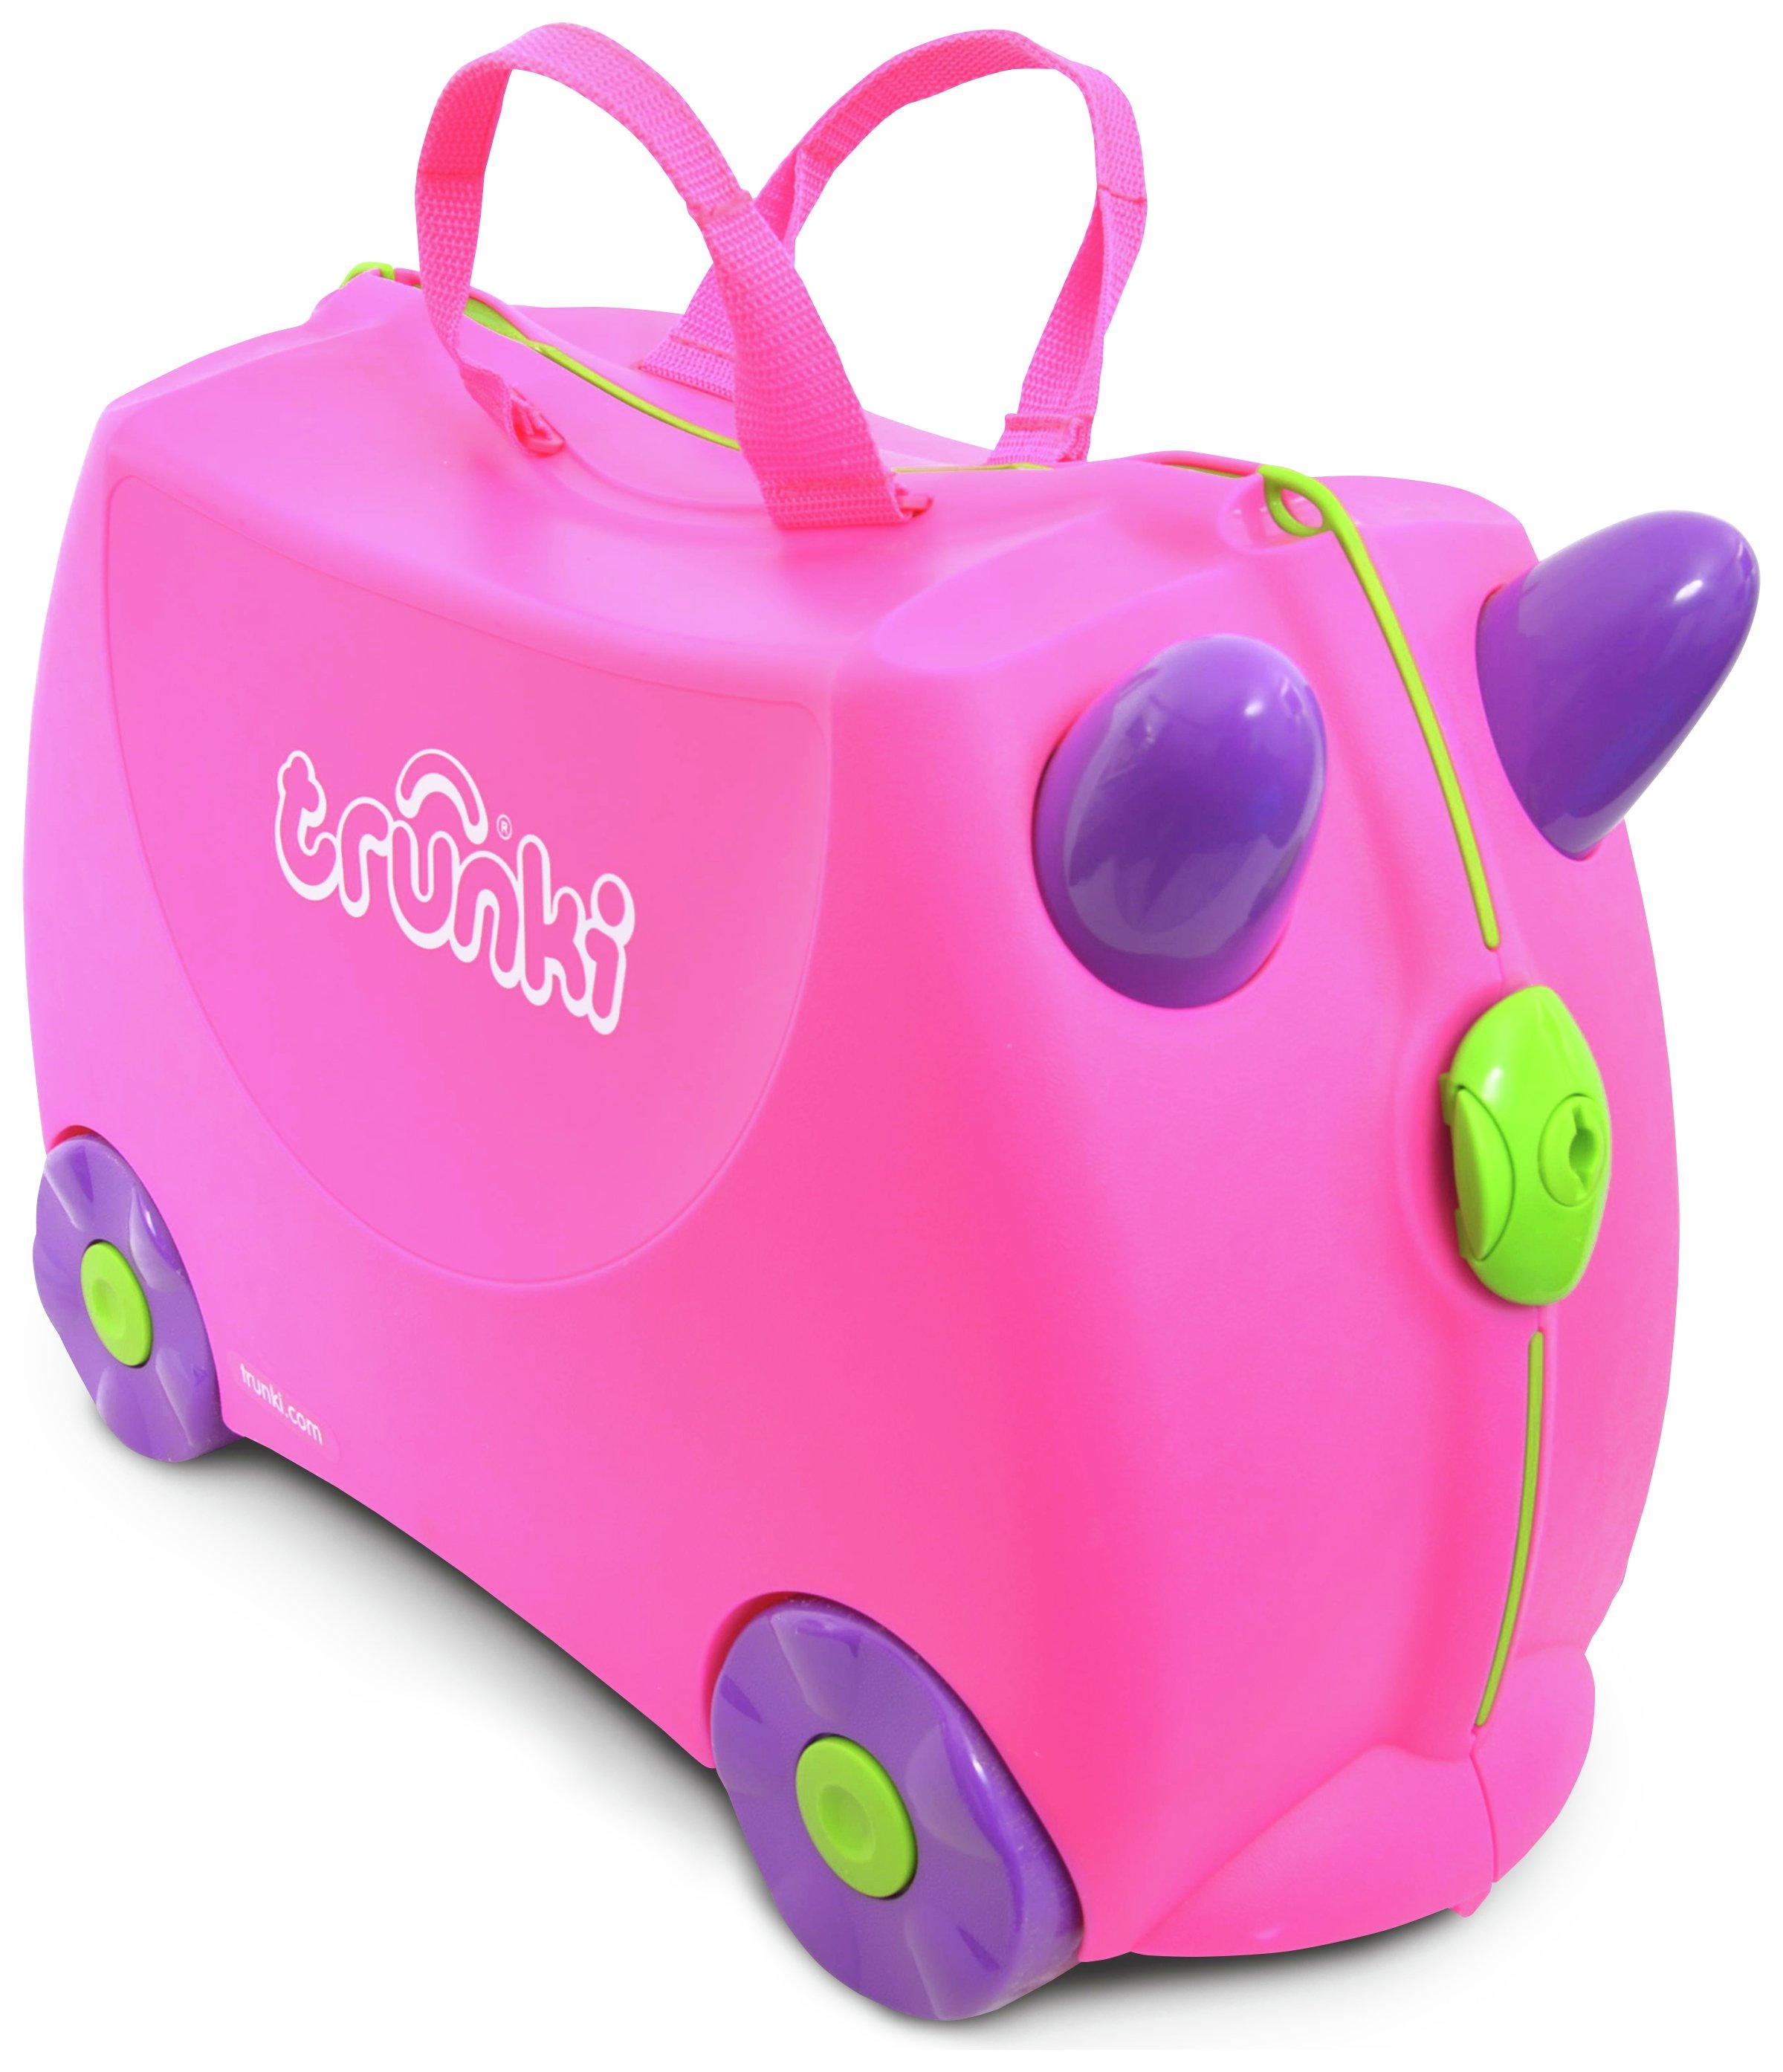 Trunki Trixie 4 Wheel Hard Ride On Suitcase - Pink